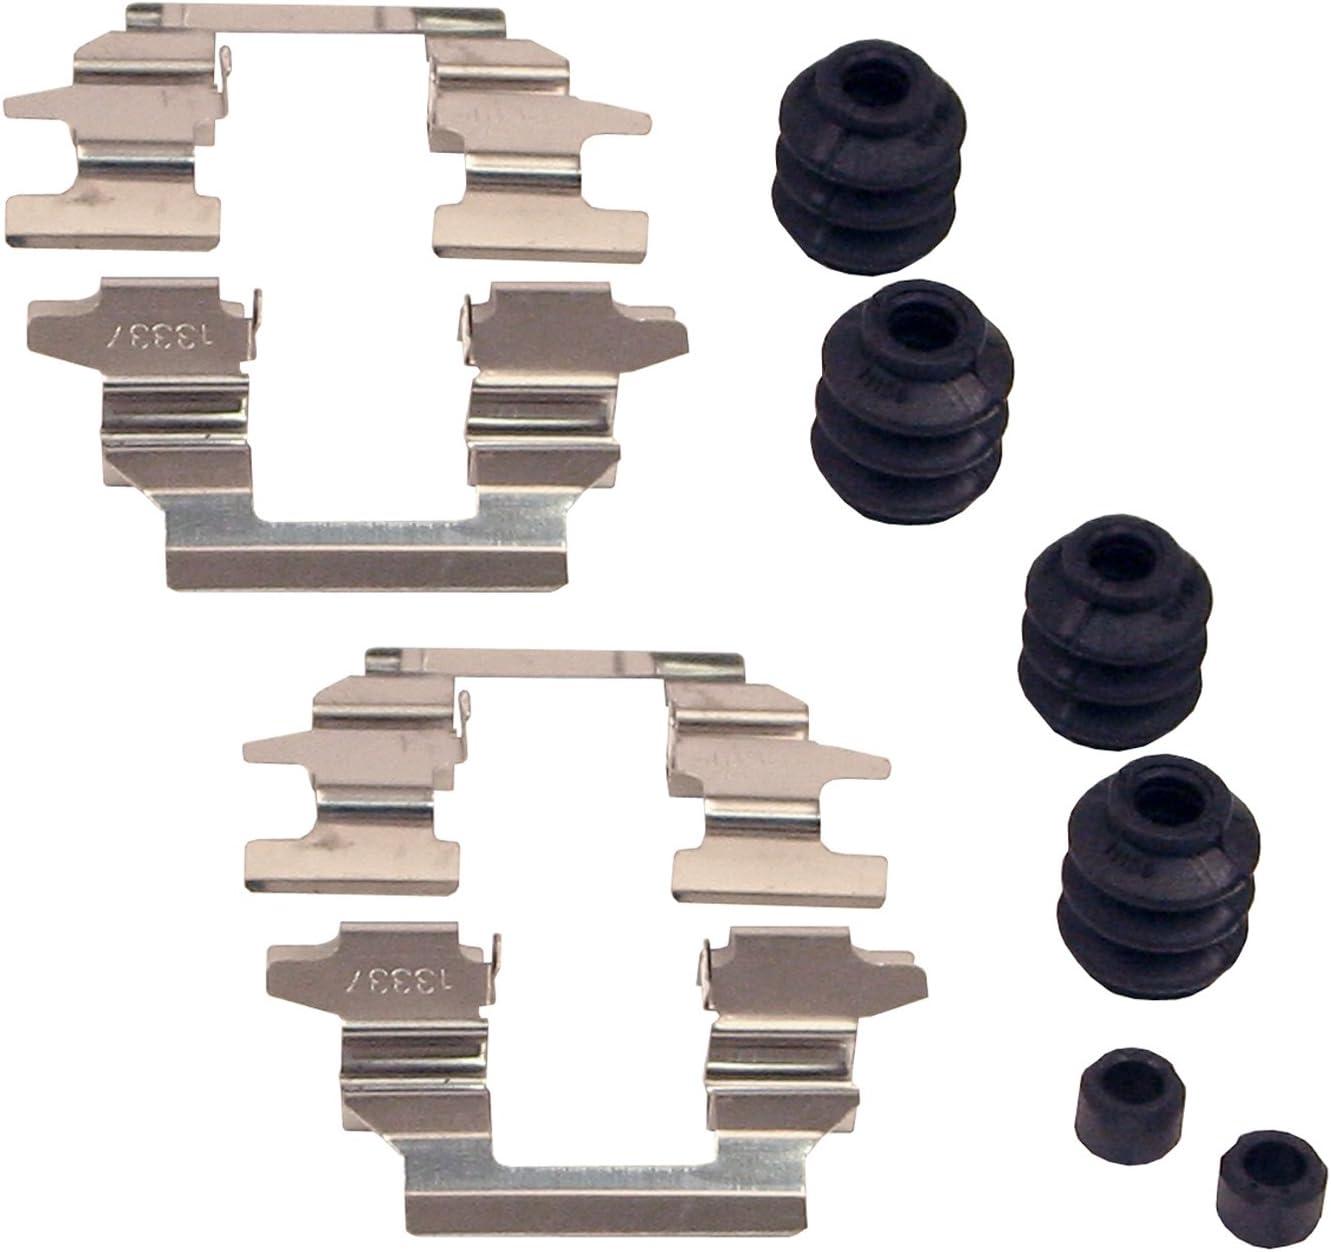 Beck Arnley 084-1624 Disc Kit Brake Max 89% OFF Online limited product Hardware